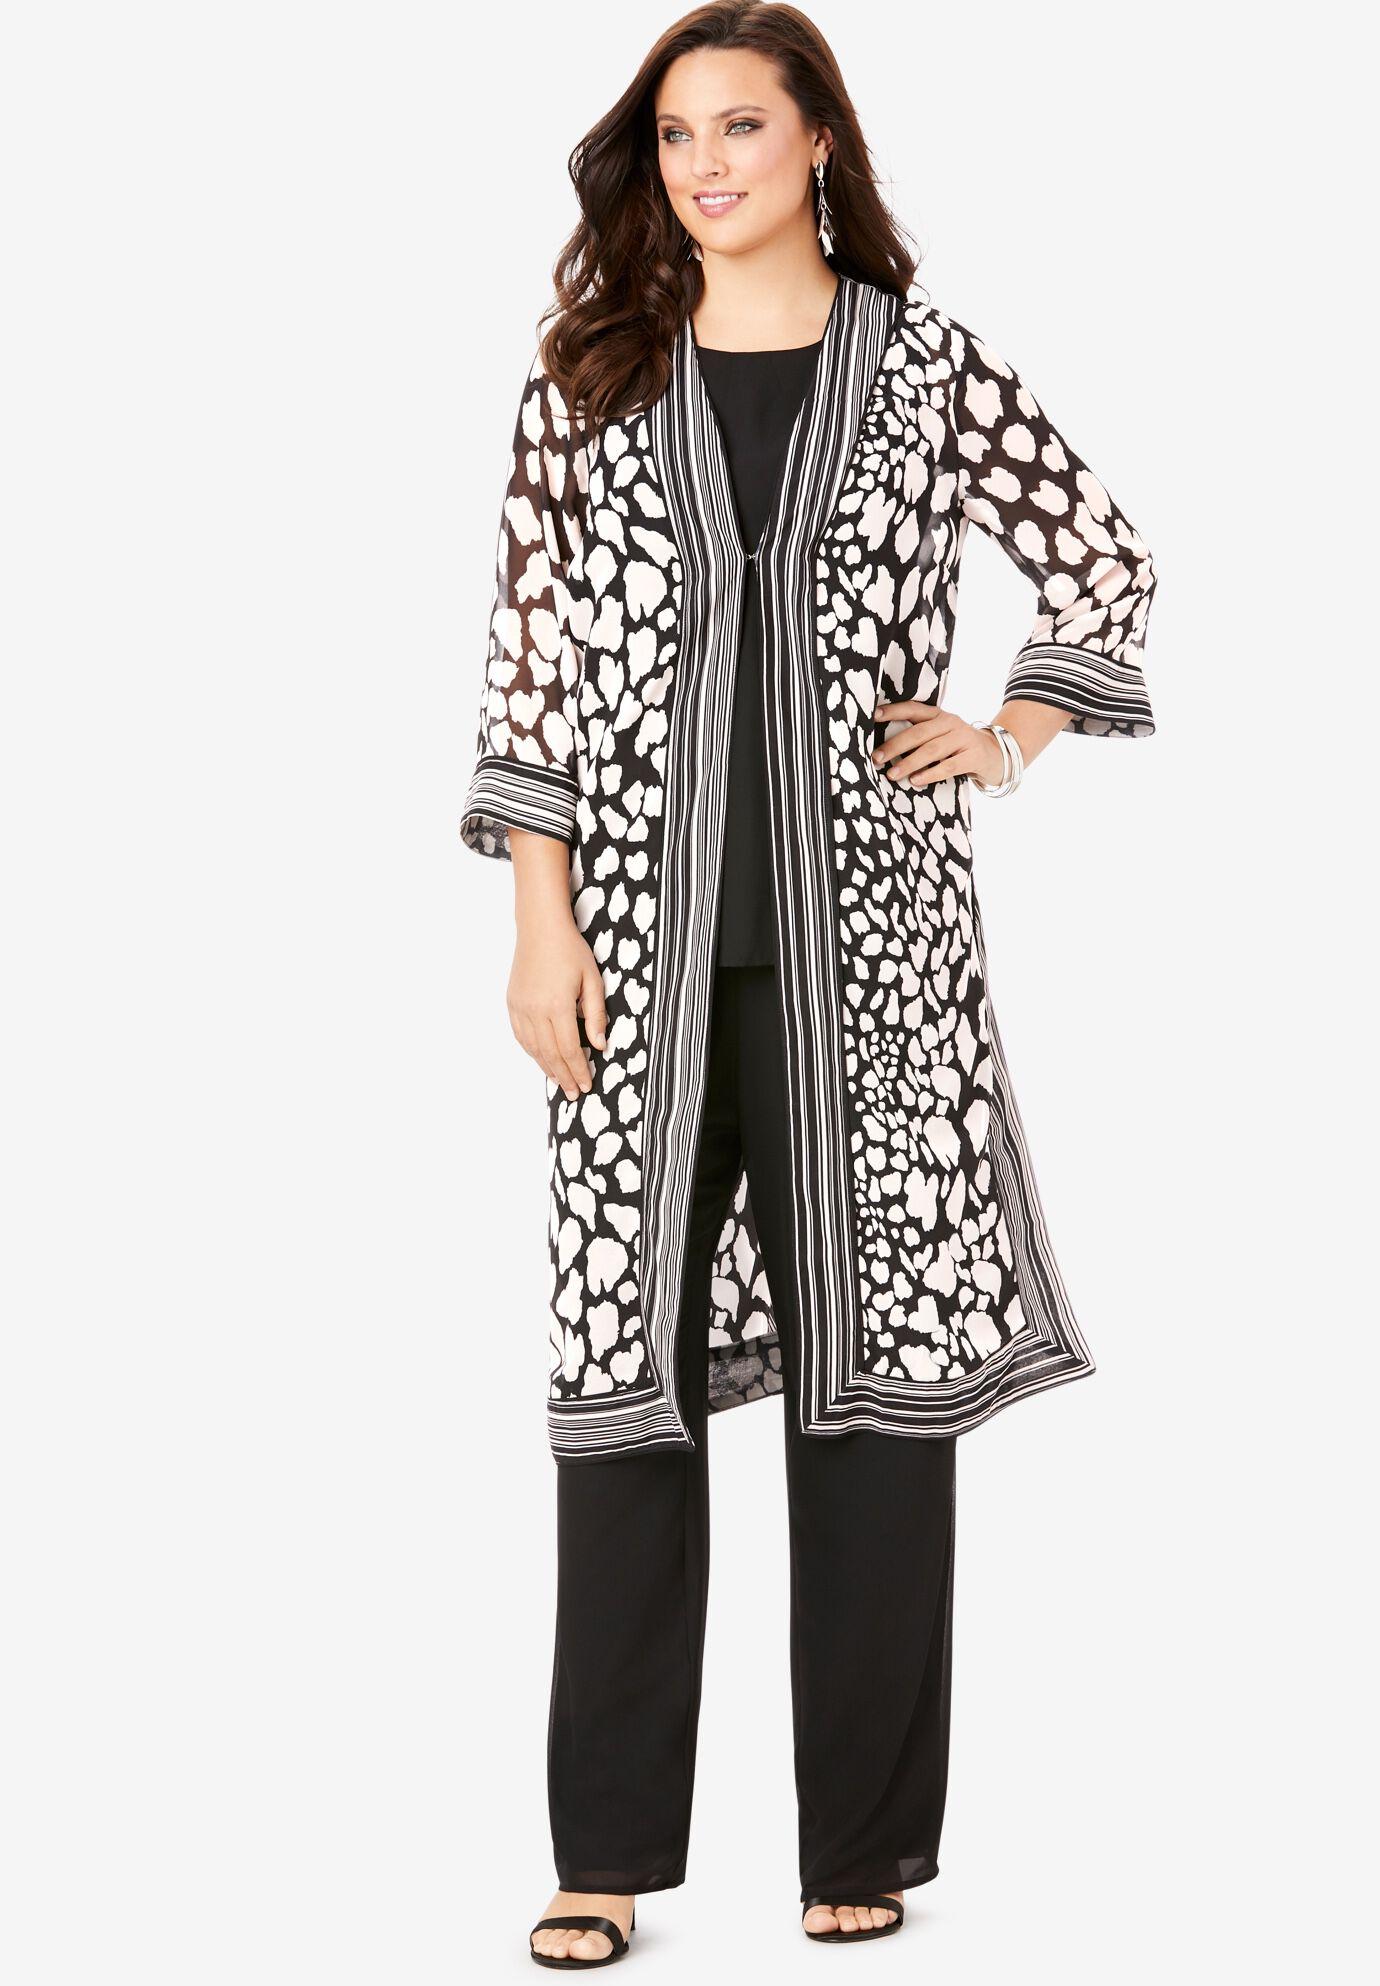 Women 2 Pieces Tee Top Formal Work Short Length Plus Size Palazzo Pants Suit Sets